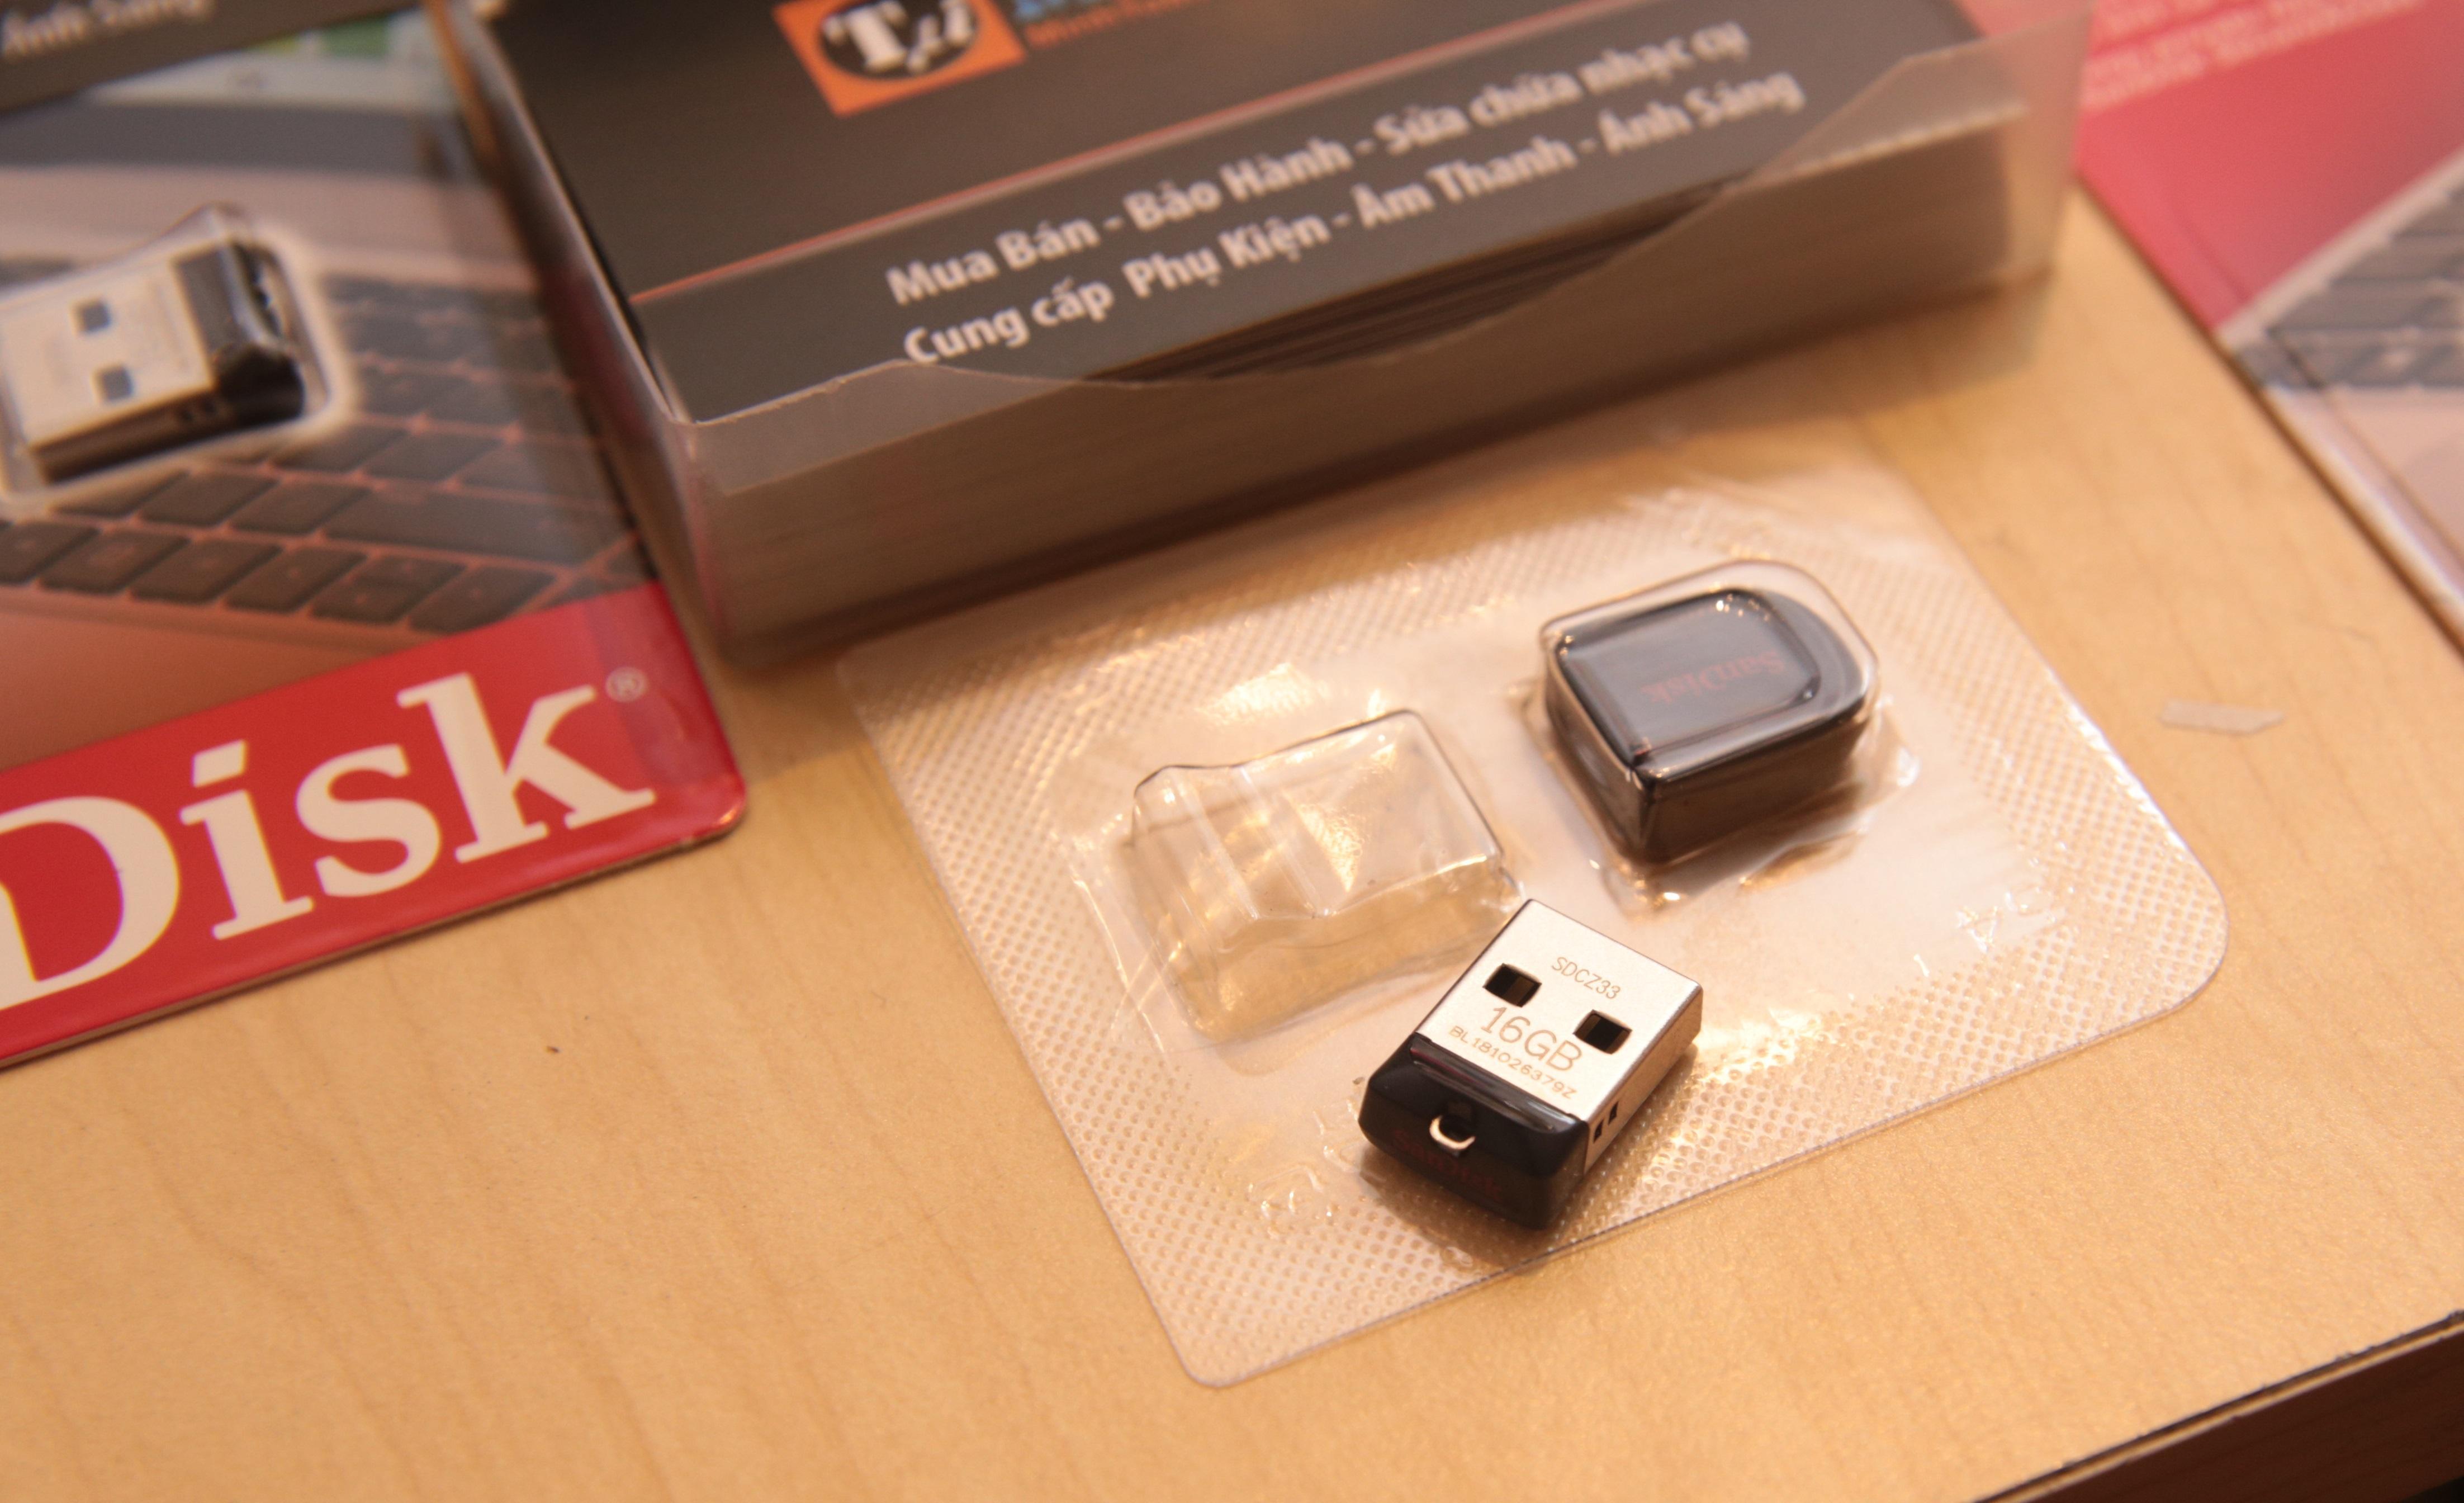 USB SANDISK 16GB